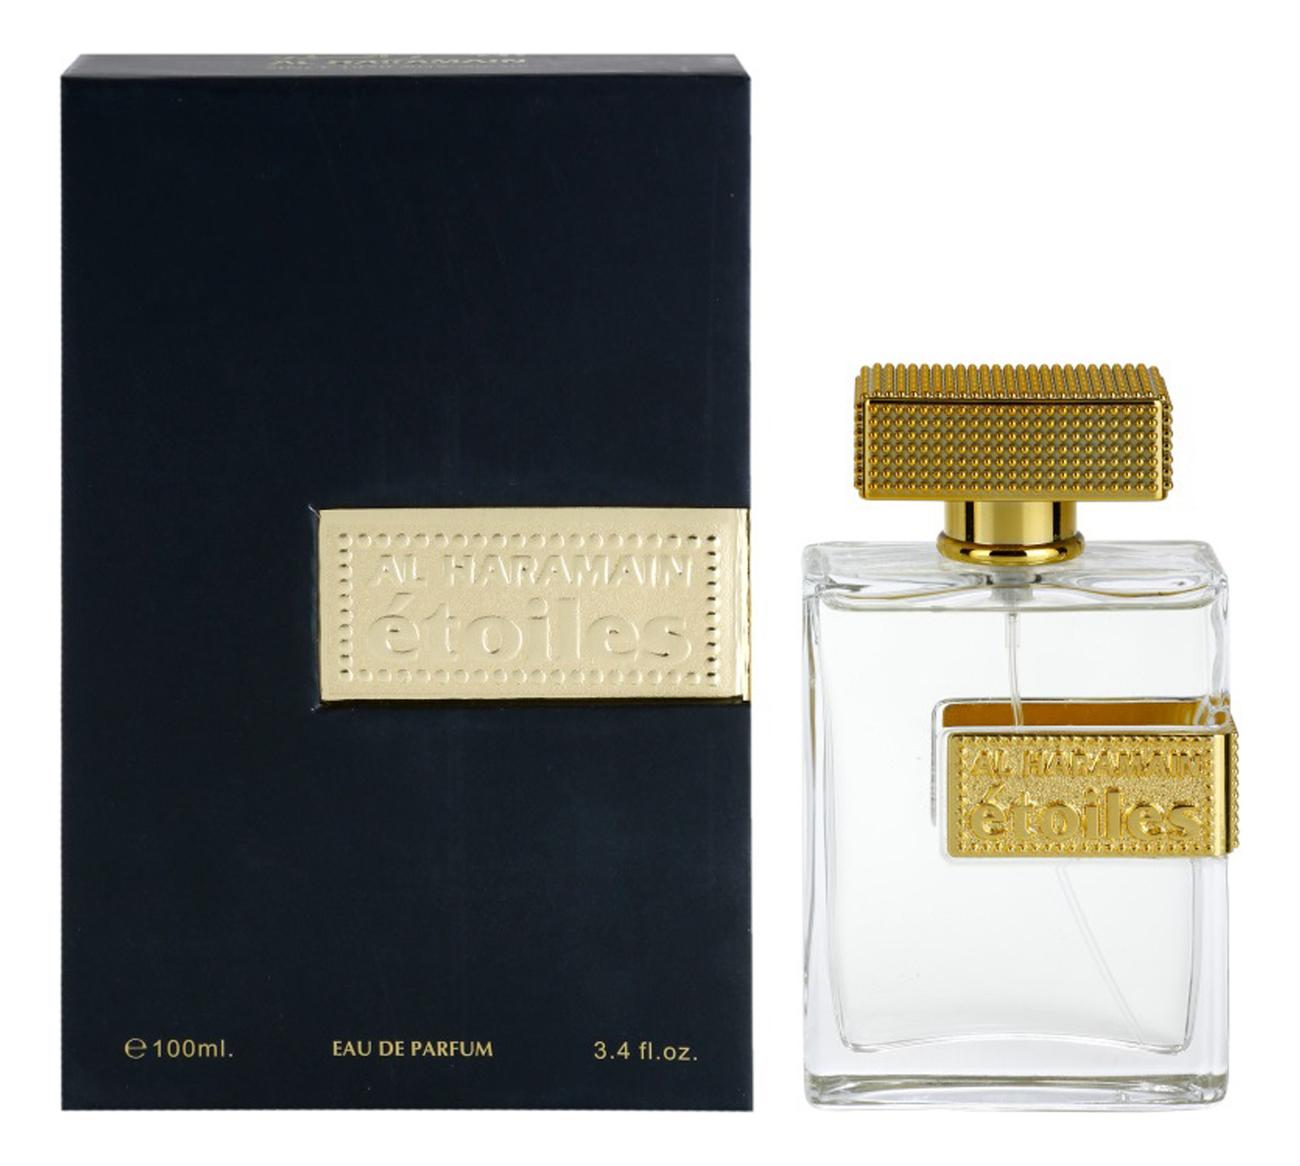 Купить Etoiles Gold: парфюмерная вода 100мл, Al Haramain Perfumes